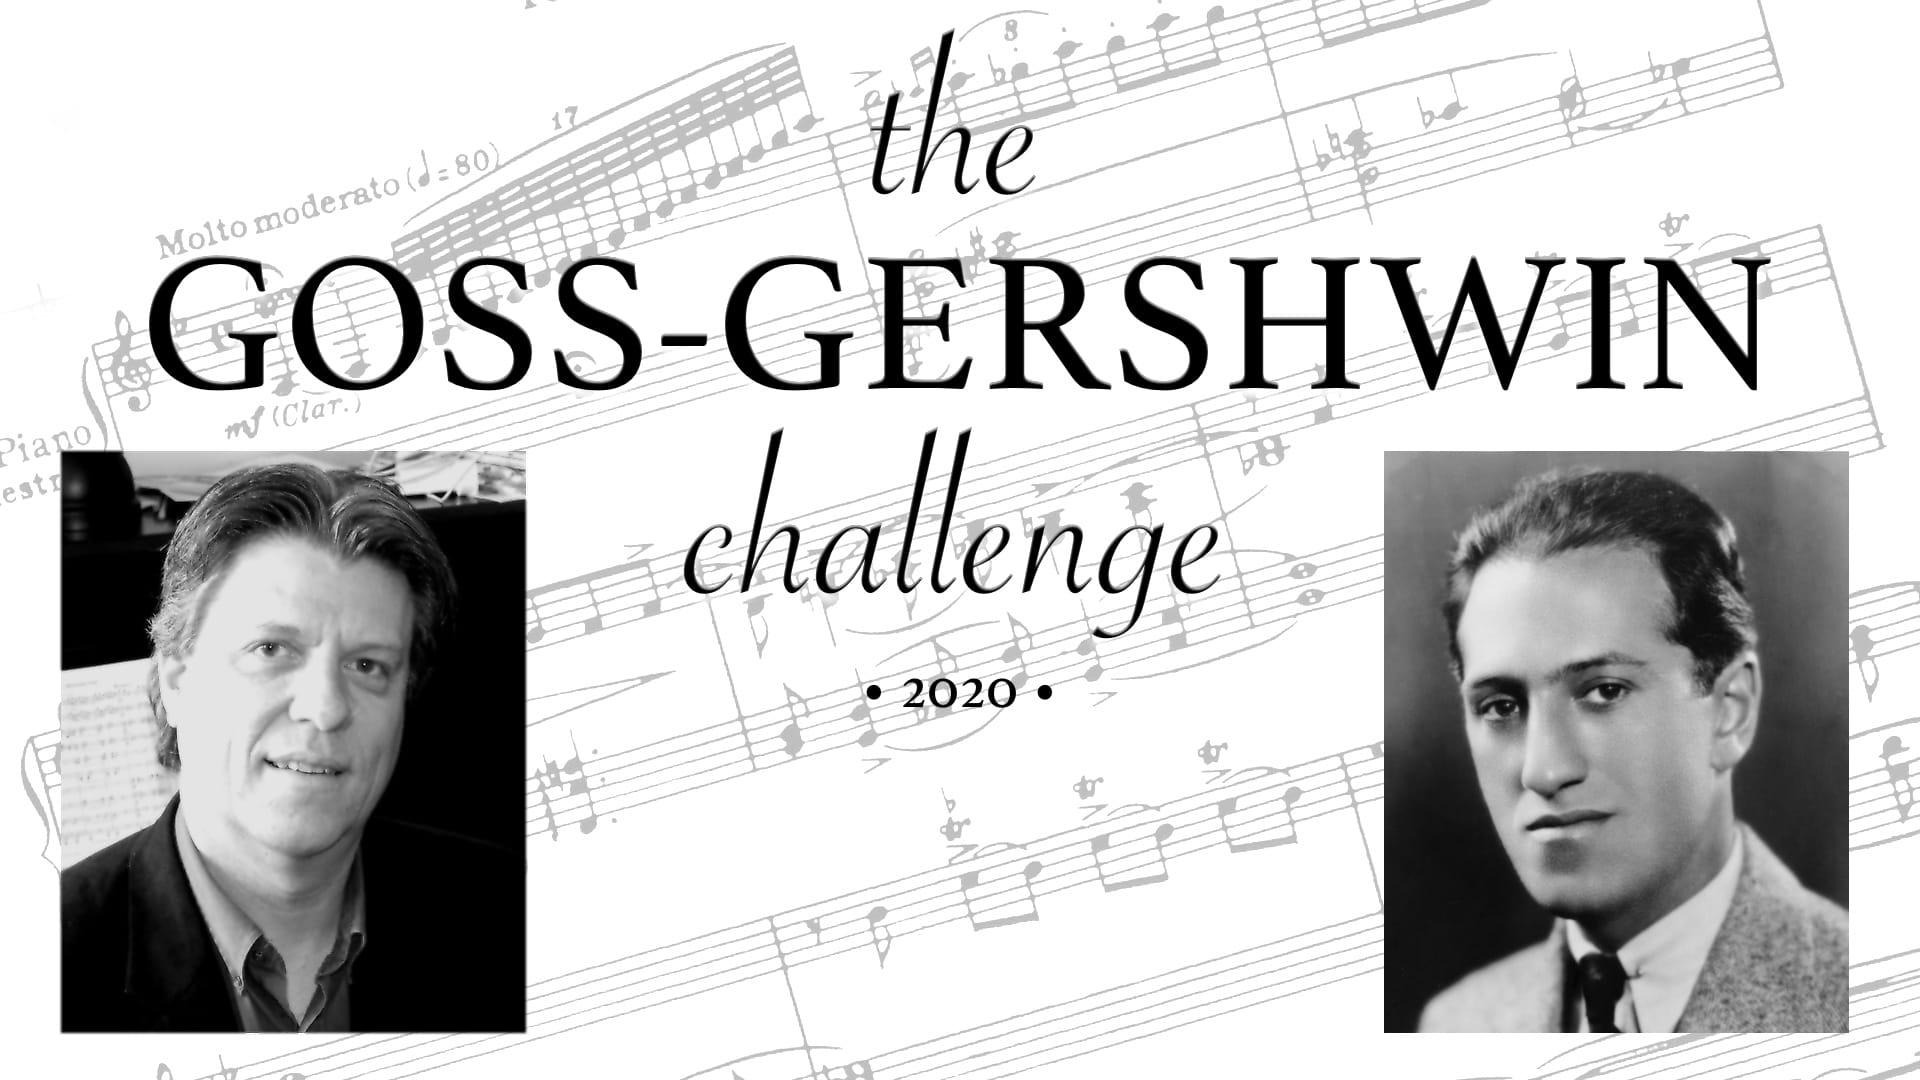 Goss-Gershwin